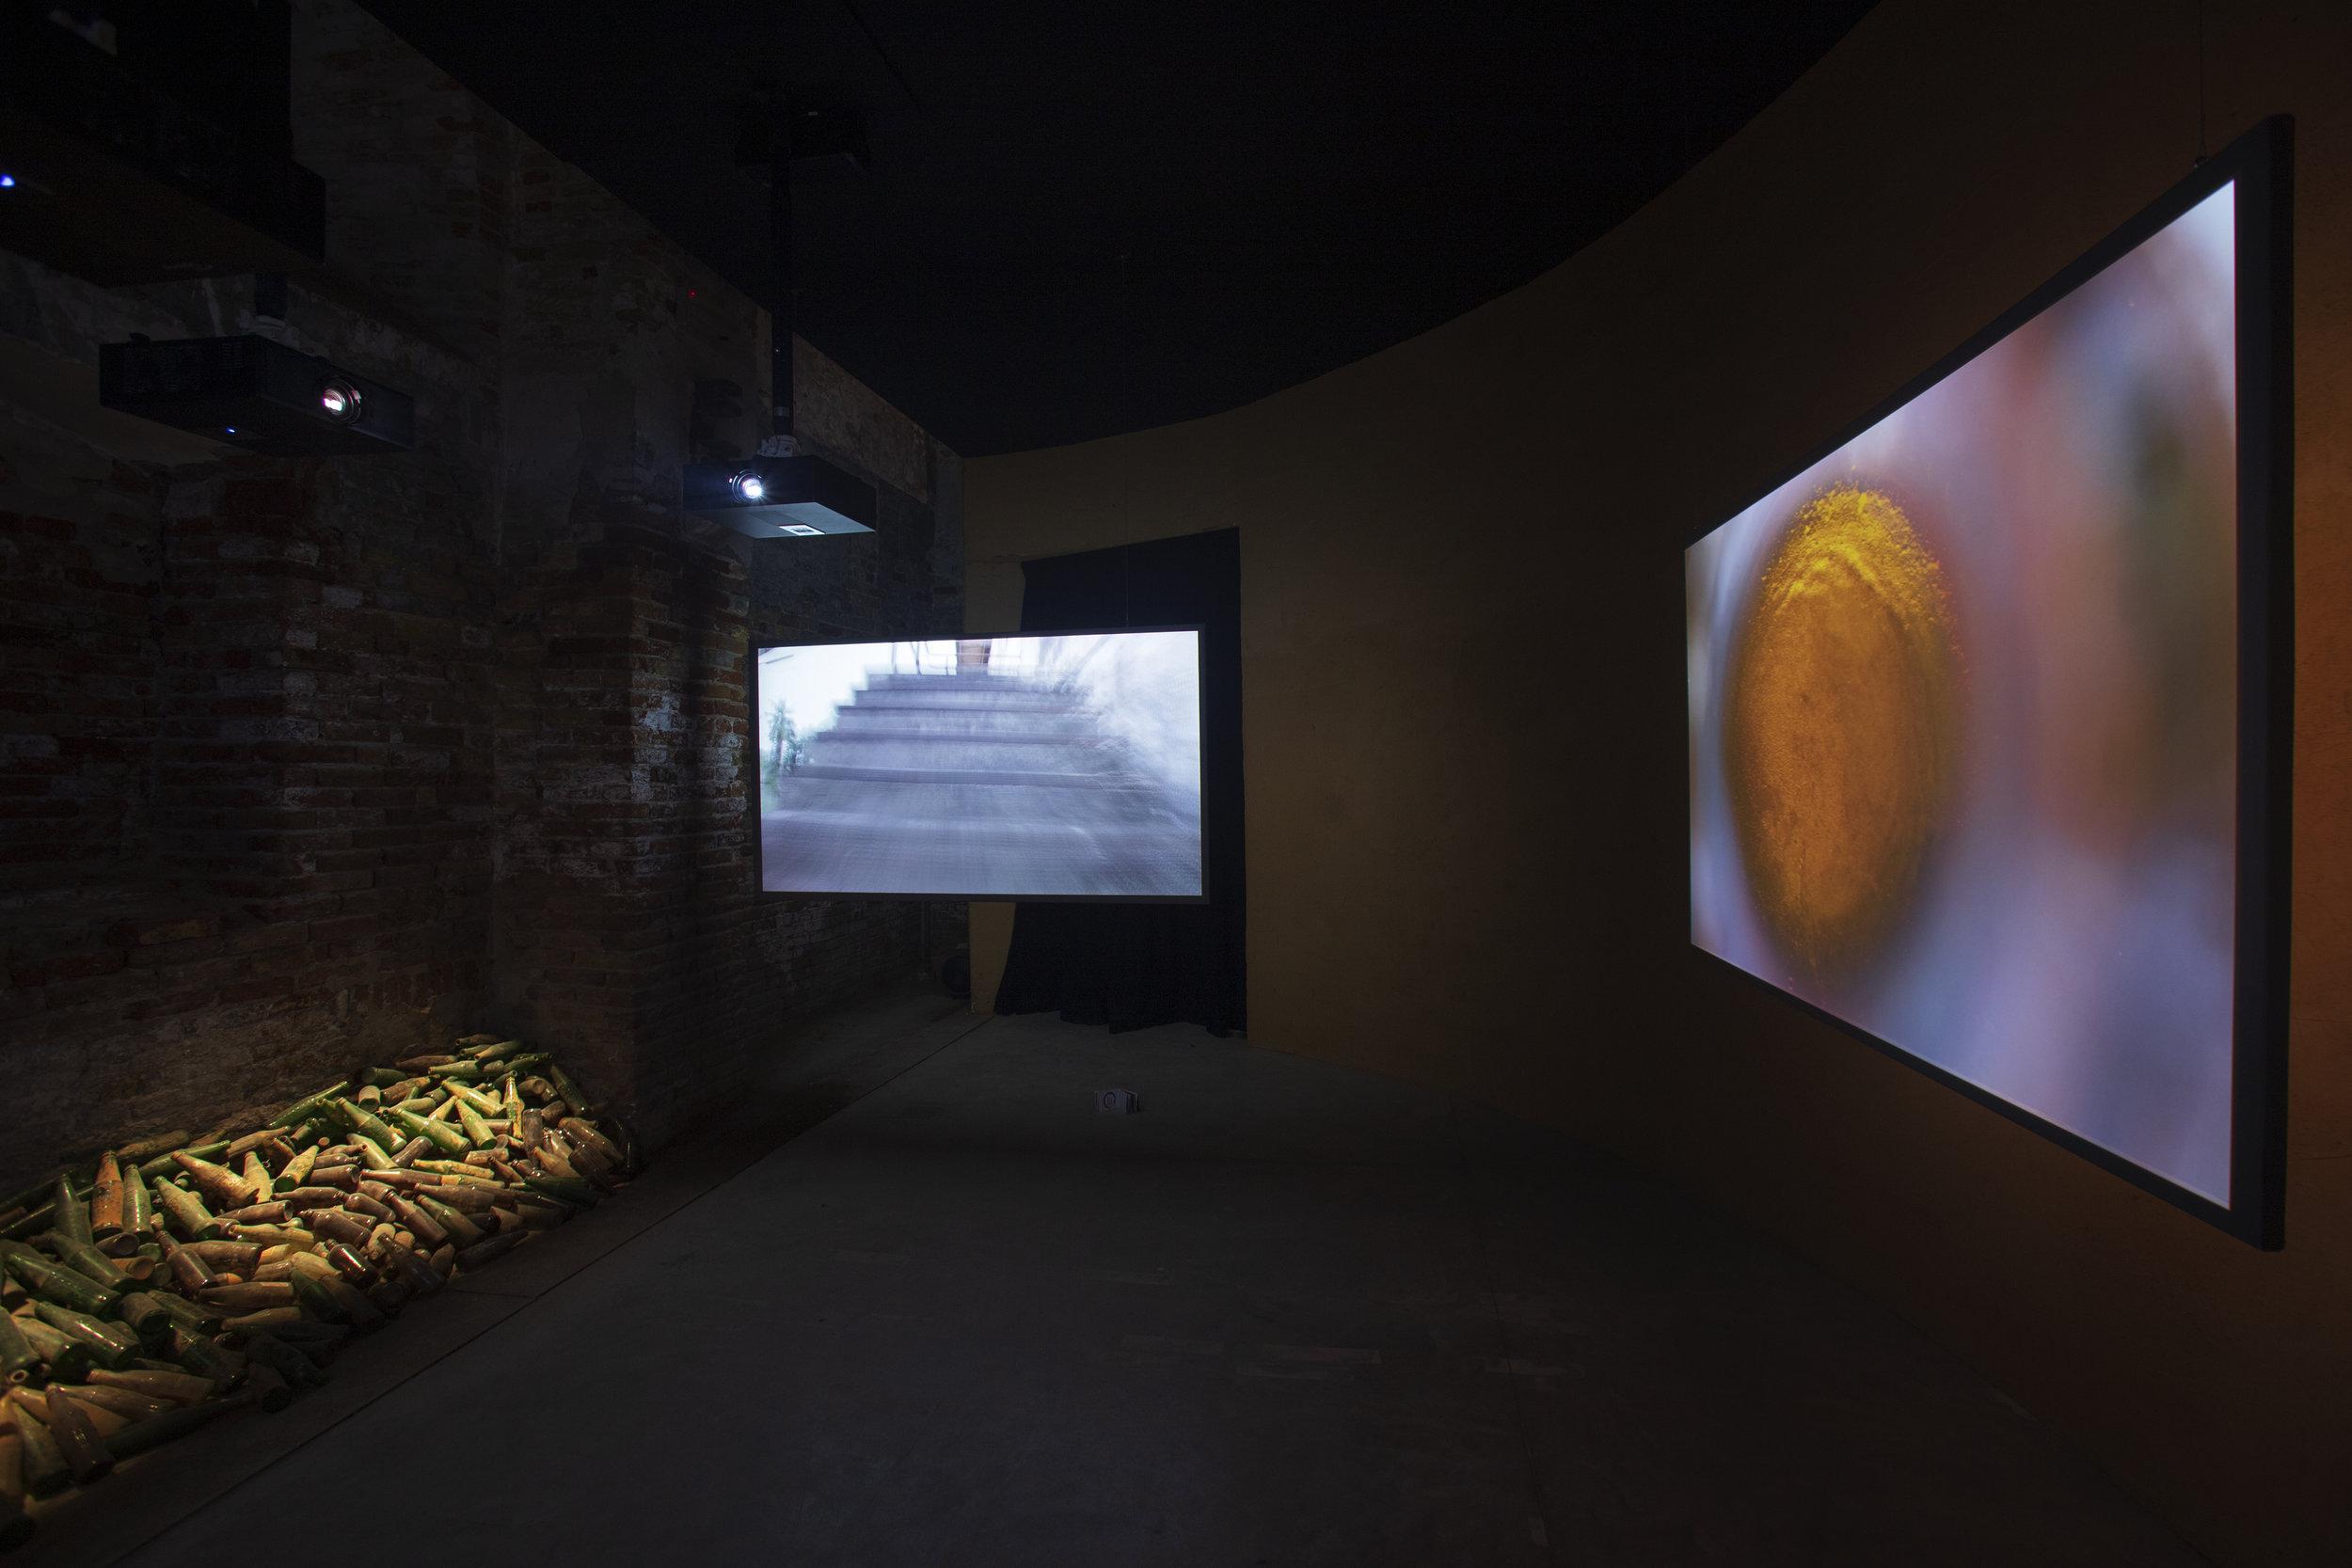 Glass Factory II  (2019) by Selasi Awusi Sosu. Installation view of Ghana Freedom. Photo by Italo Rondinella. Courtesy of the artist, La Biennale di Venezia.